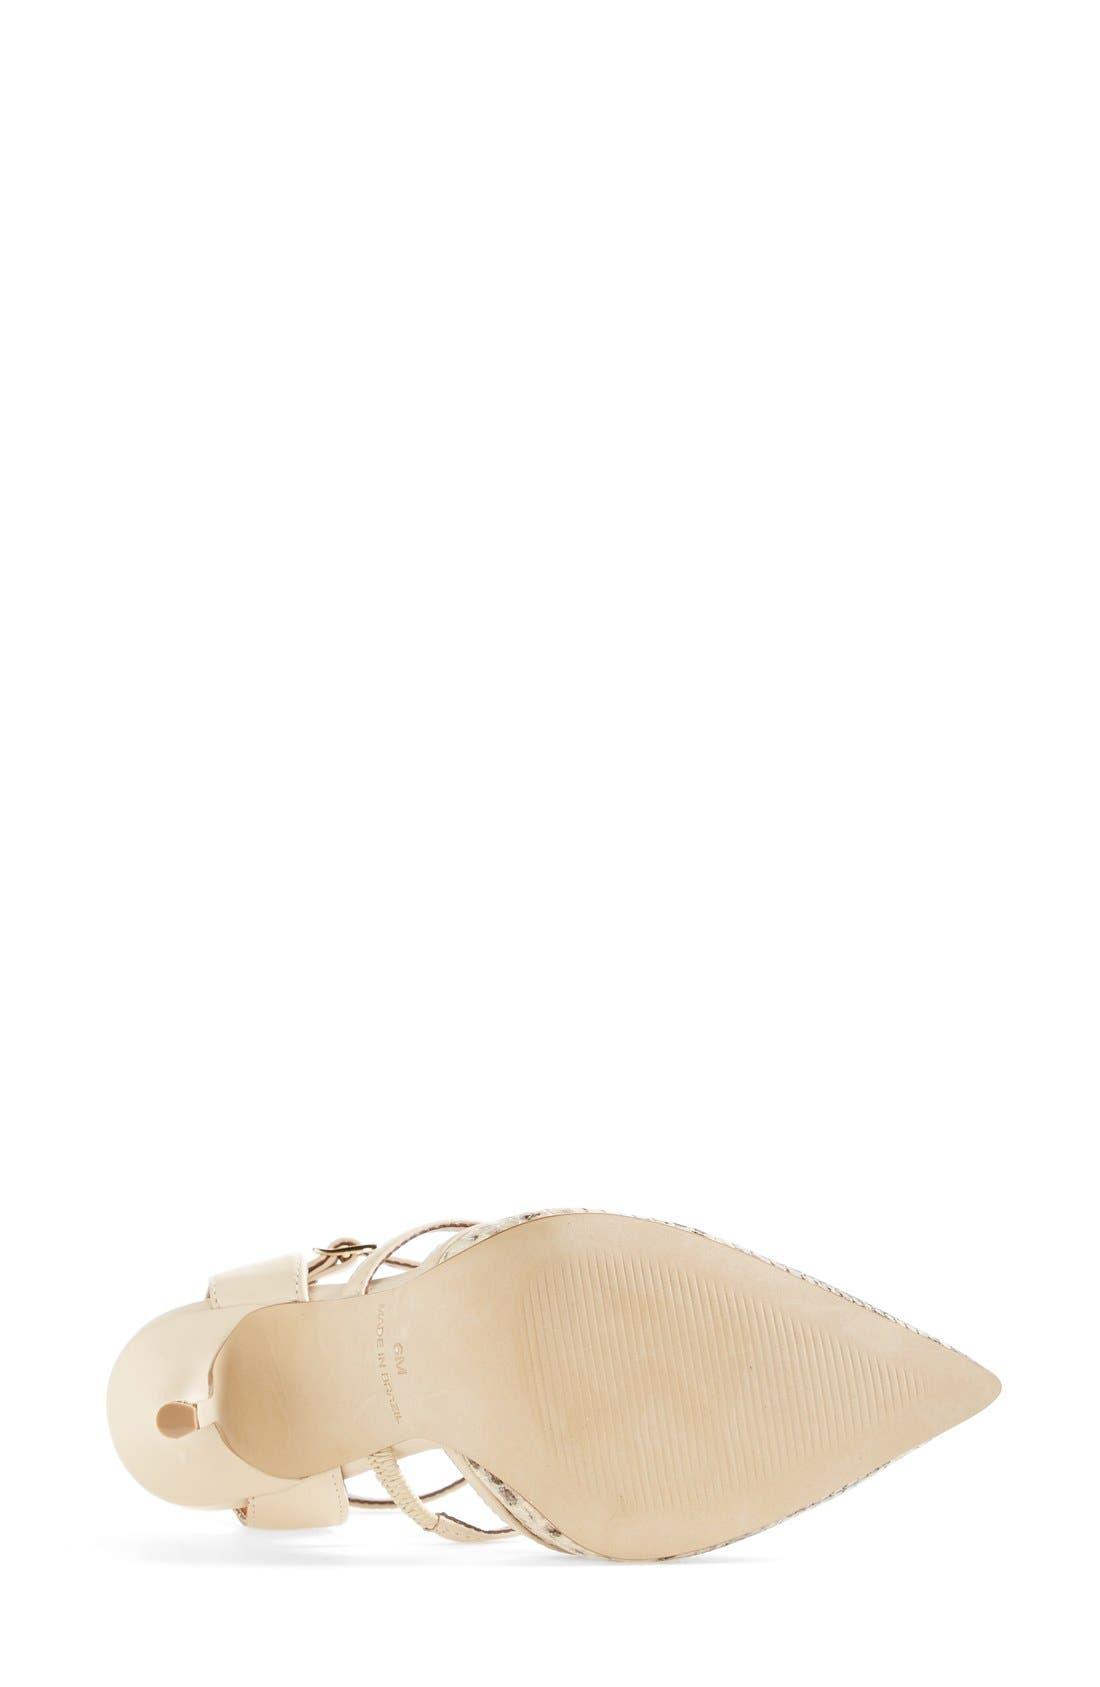 Alternate Image 4  - Steve Madden 'Surfice' Pointy Toe Pump (Women)